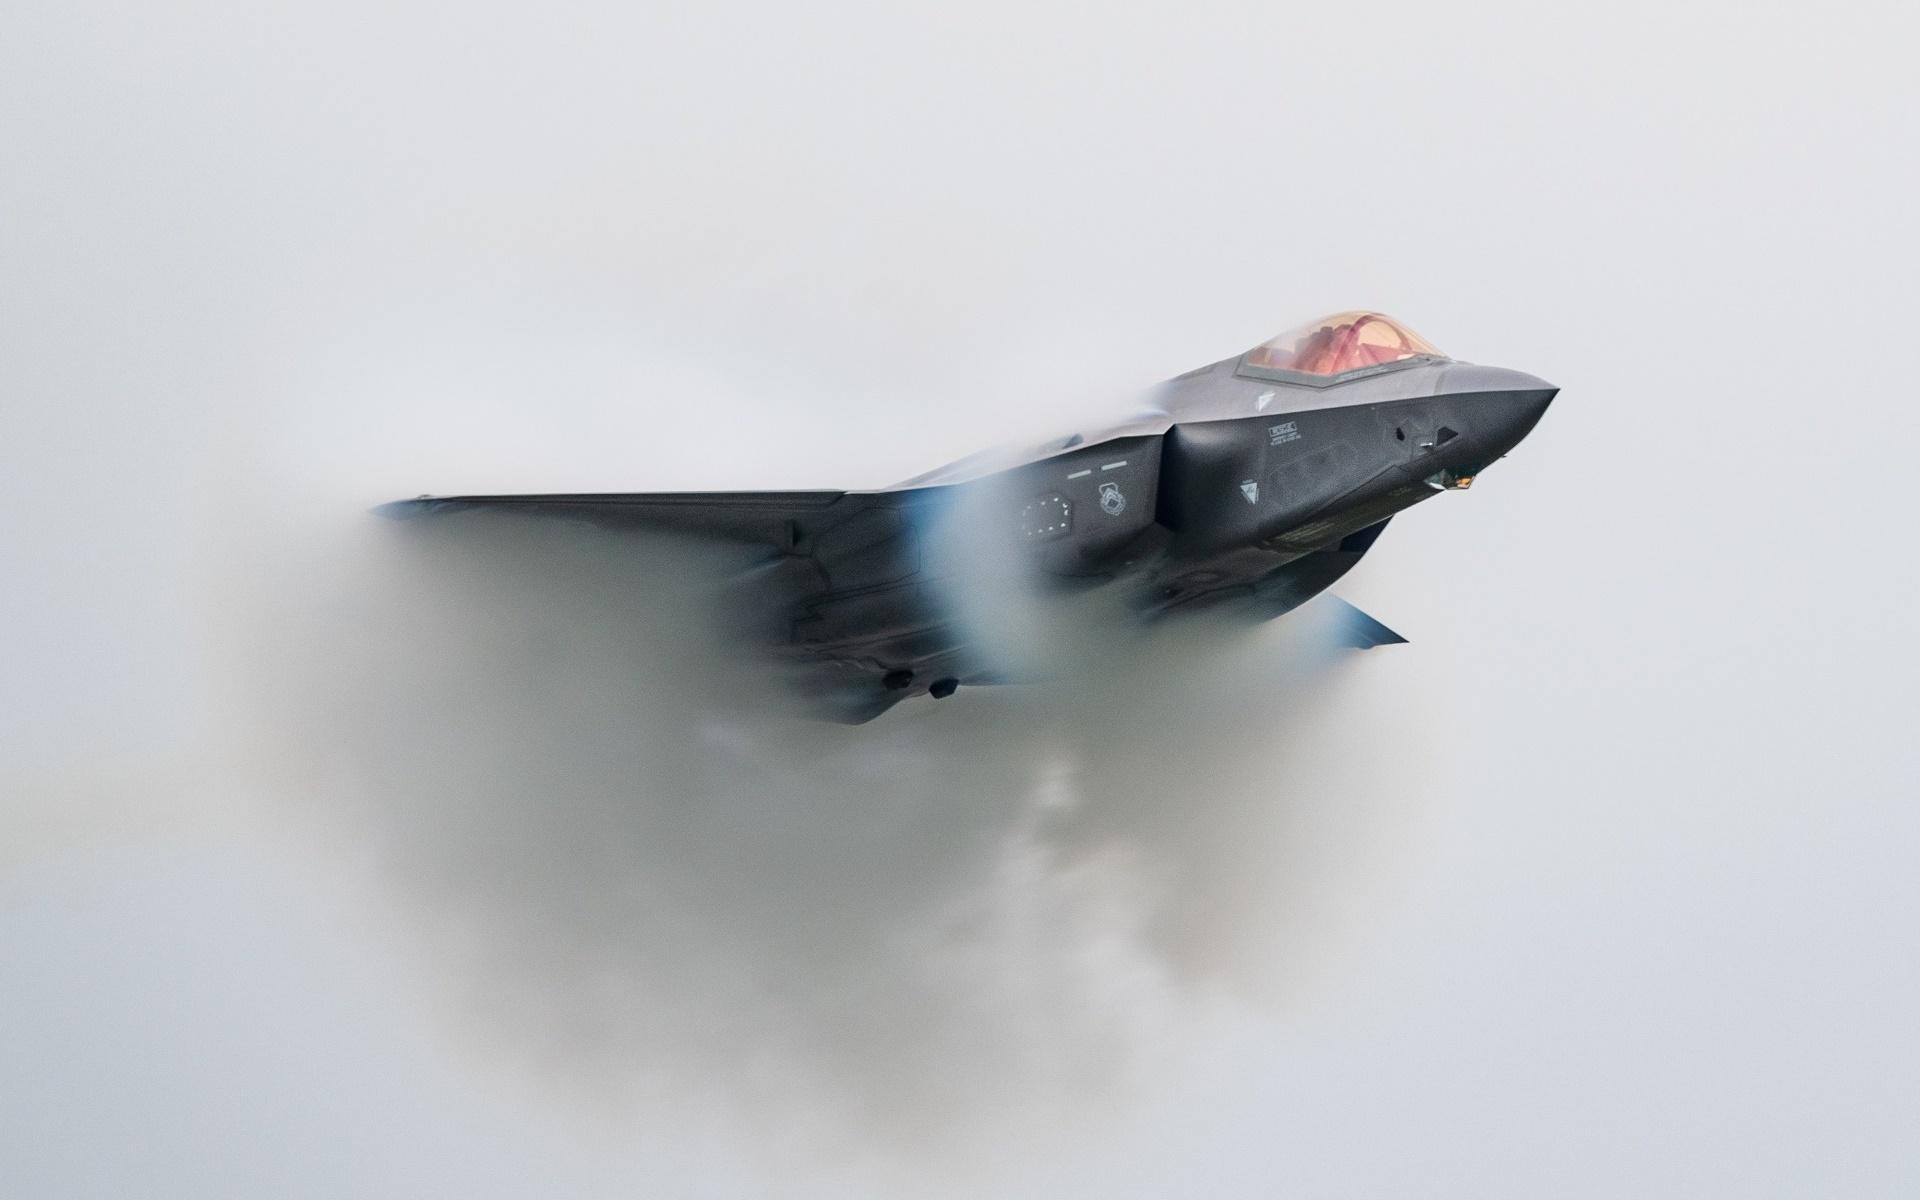 General 1920x1200 Lockheed Martin F-35 Lightning II aircraft vehicle military military aircraft low-angle